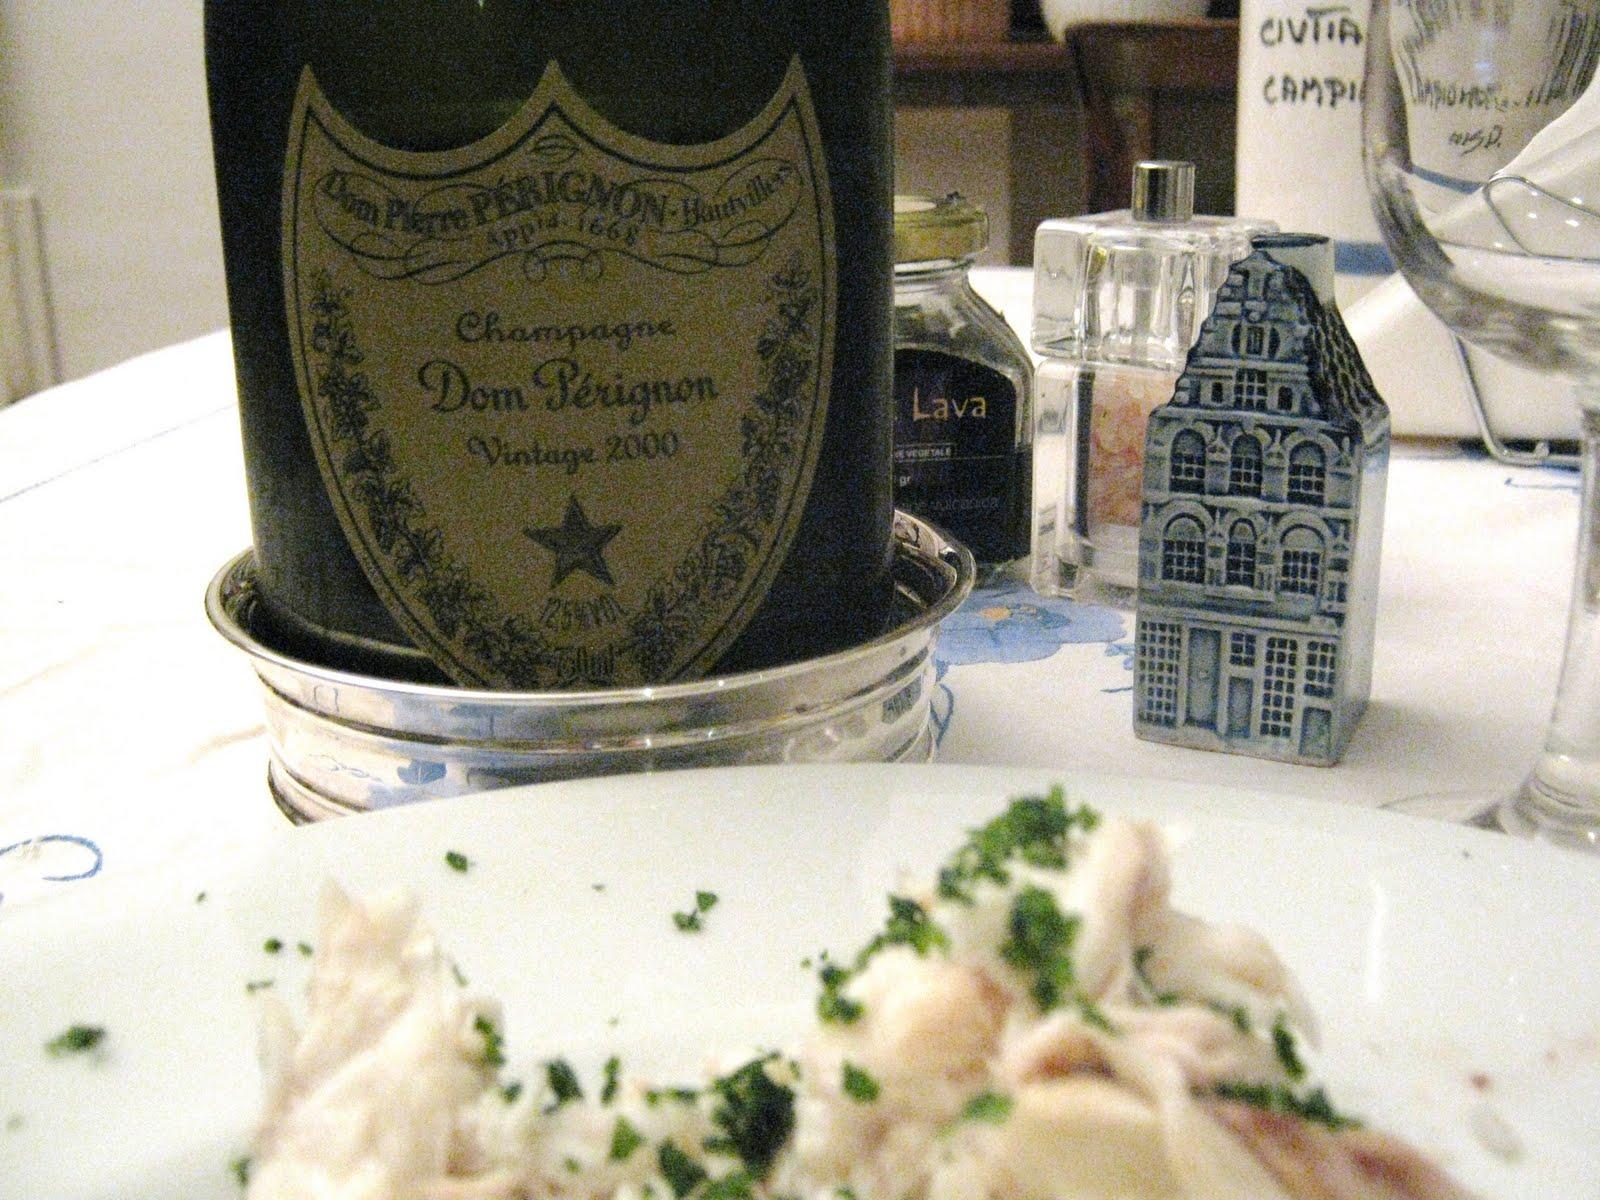 tavola  imbandita con champagne